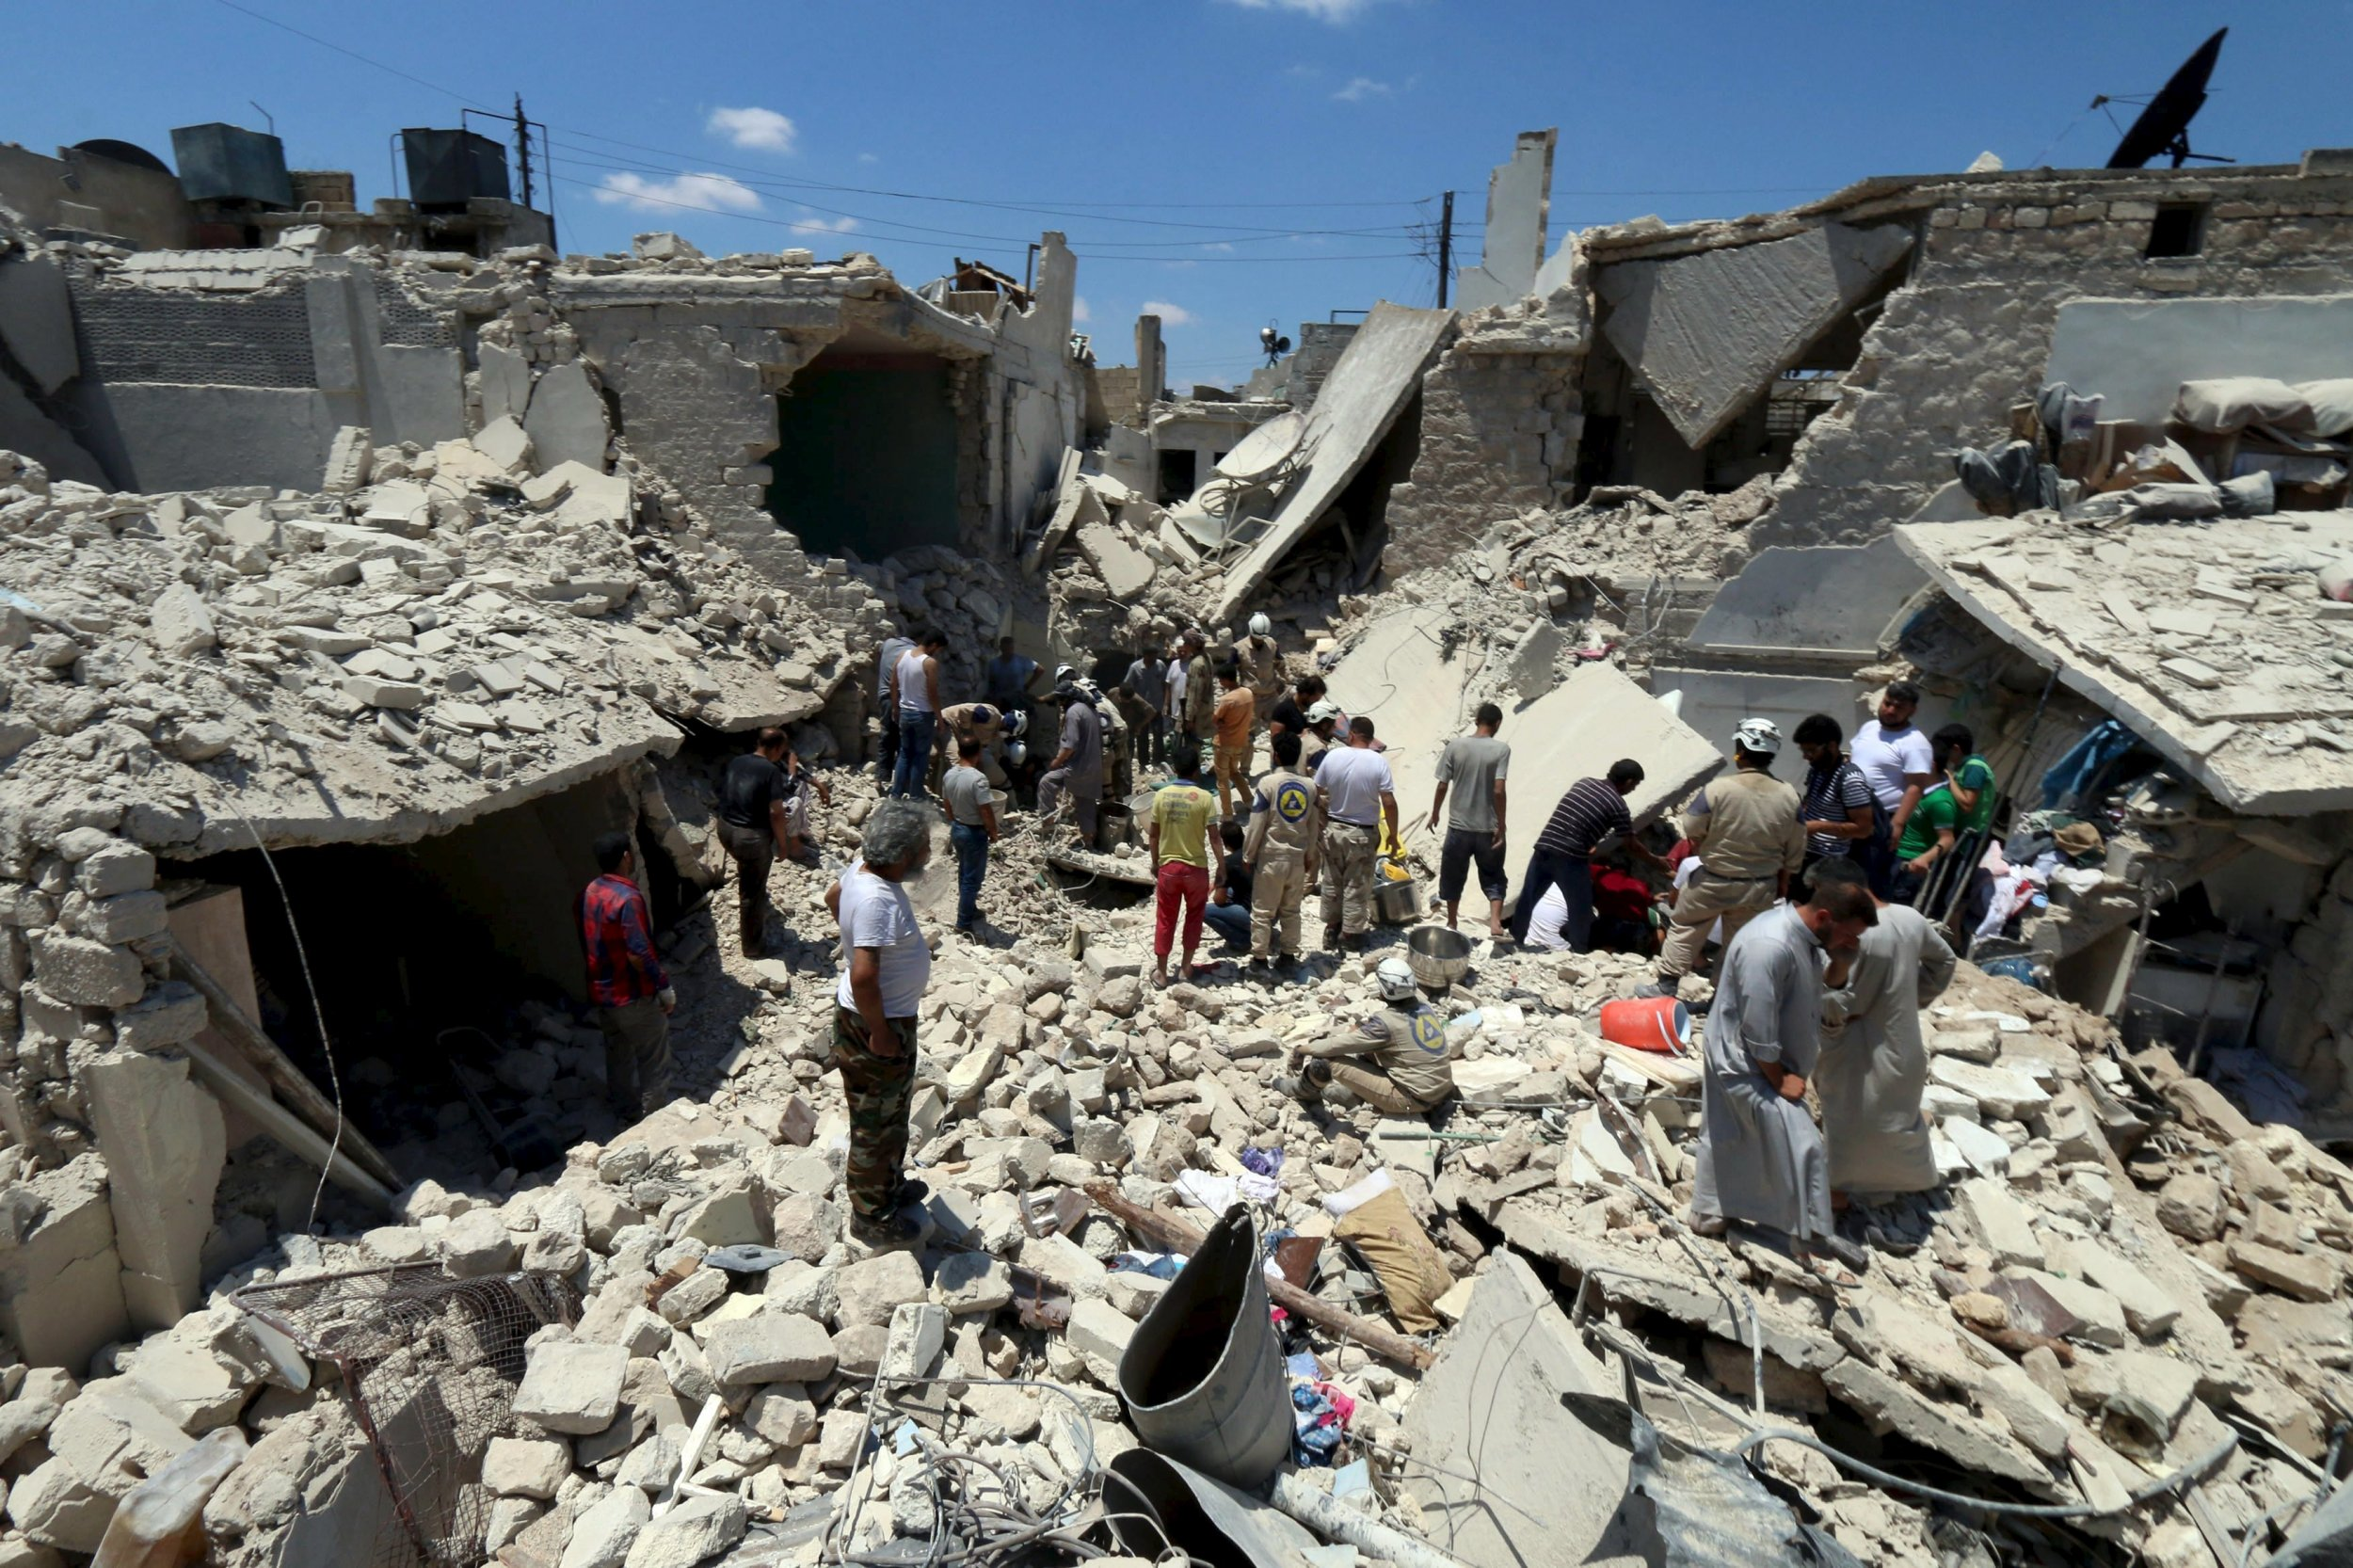 2015-06-21T131116Z_1405909857_GF10000135044_RTRMADP_3_MIDEAST-CRISIS-SYRIA